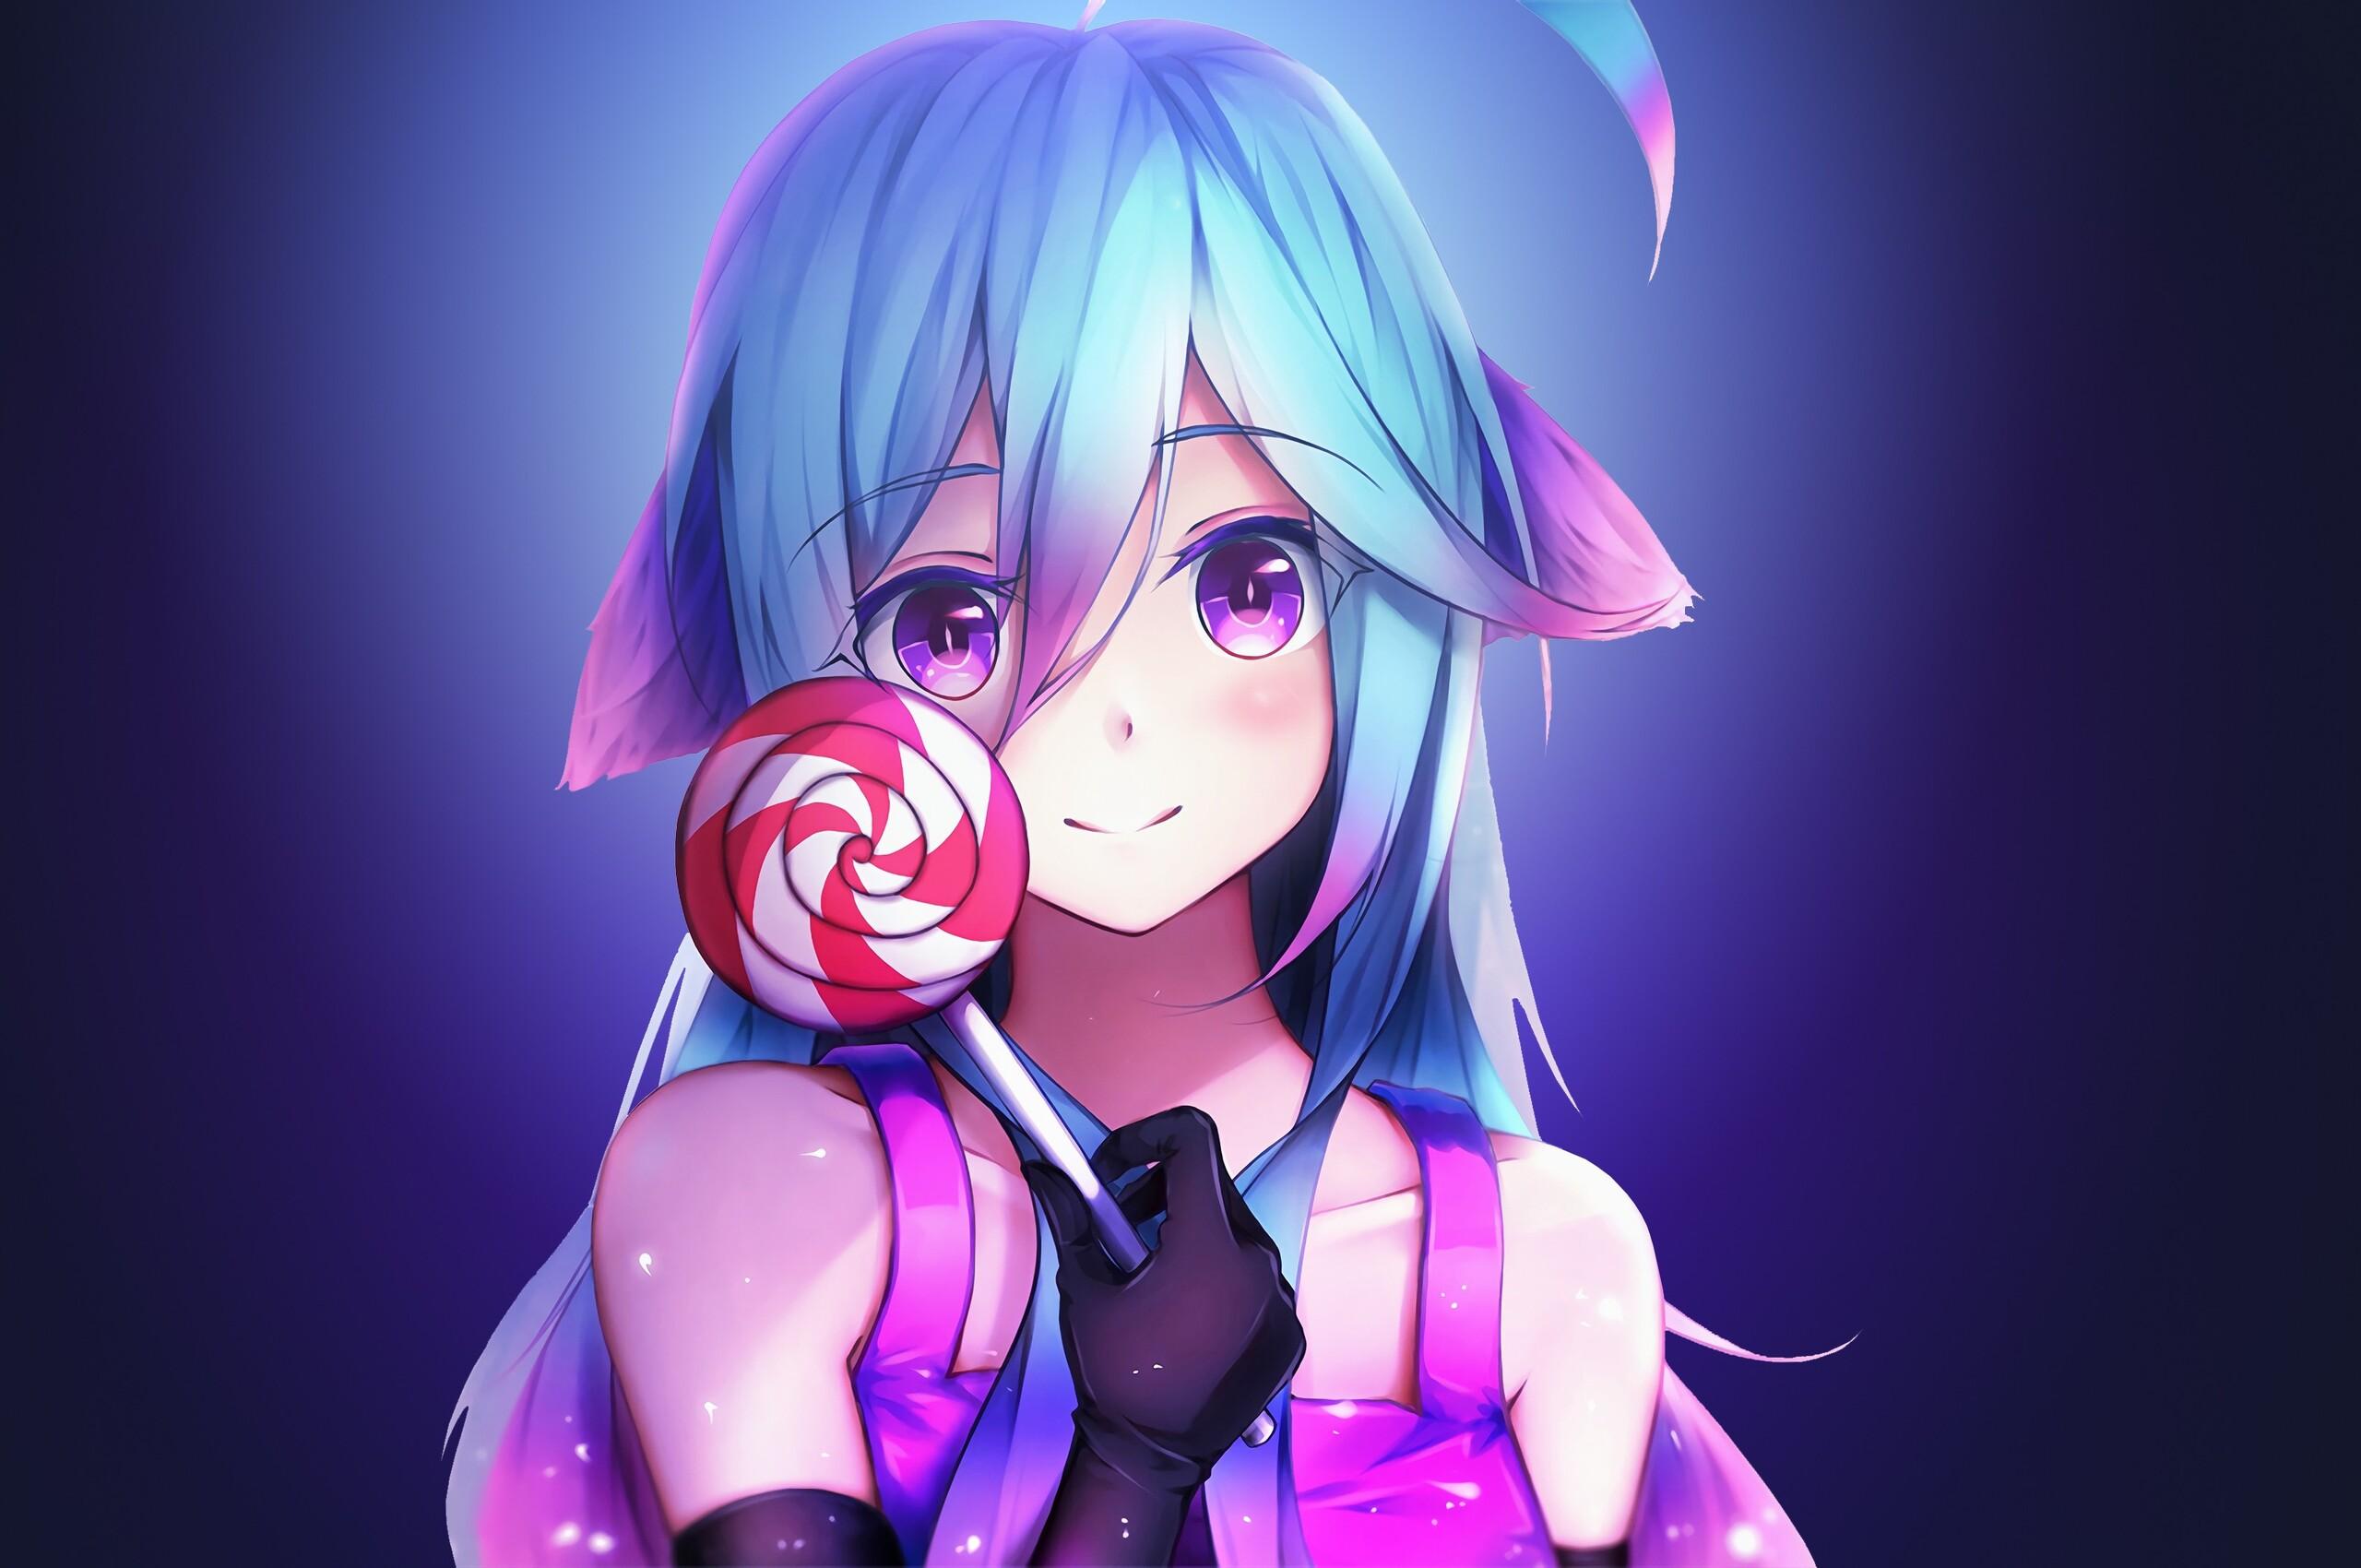 2560x1700 anime girl cute rainbows and lolipop chromebook - Wallpaper hd 1920x1080 anime ...